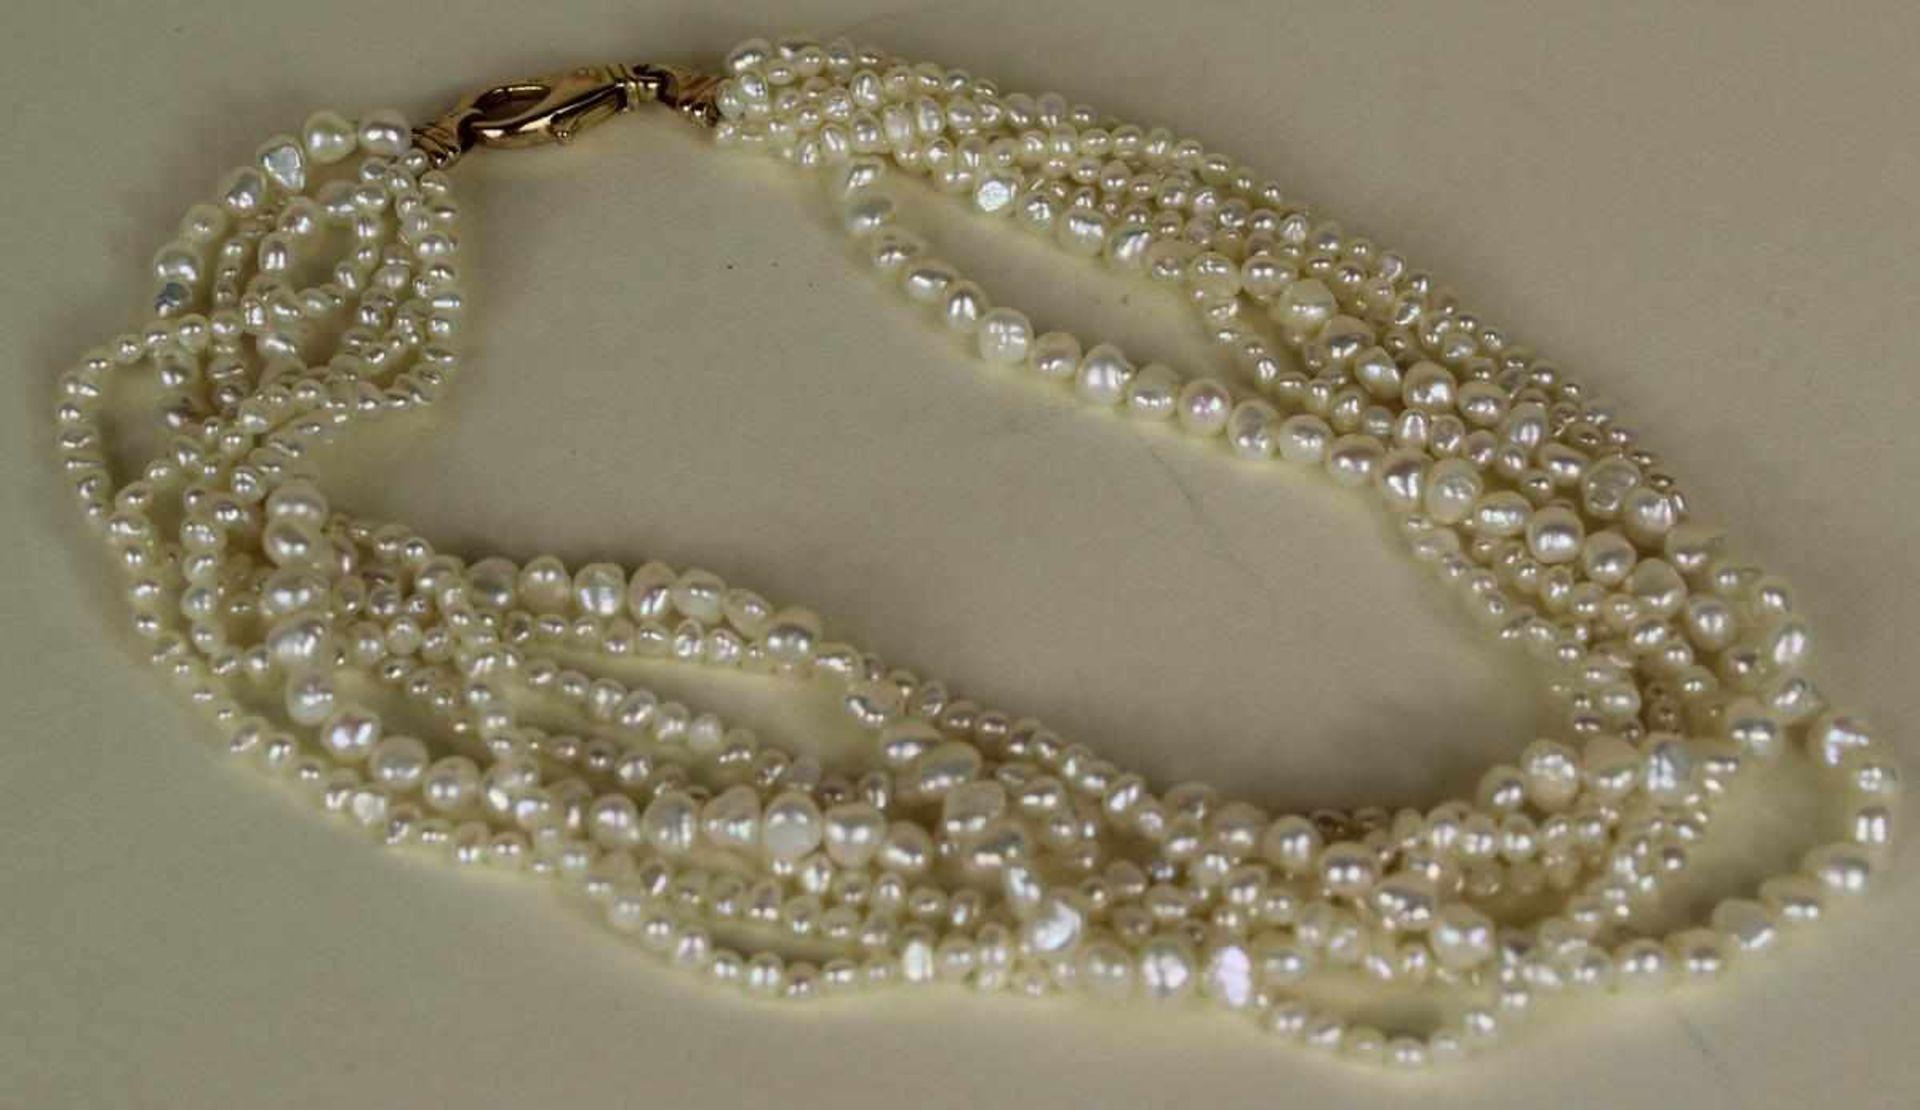 Perlenkette mit Goldverschluss 14 kt, verschieden grosse Süsswasserperlen, Verschluss punziert